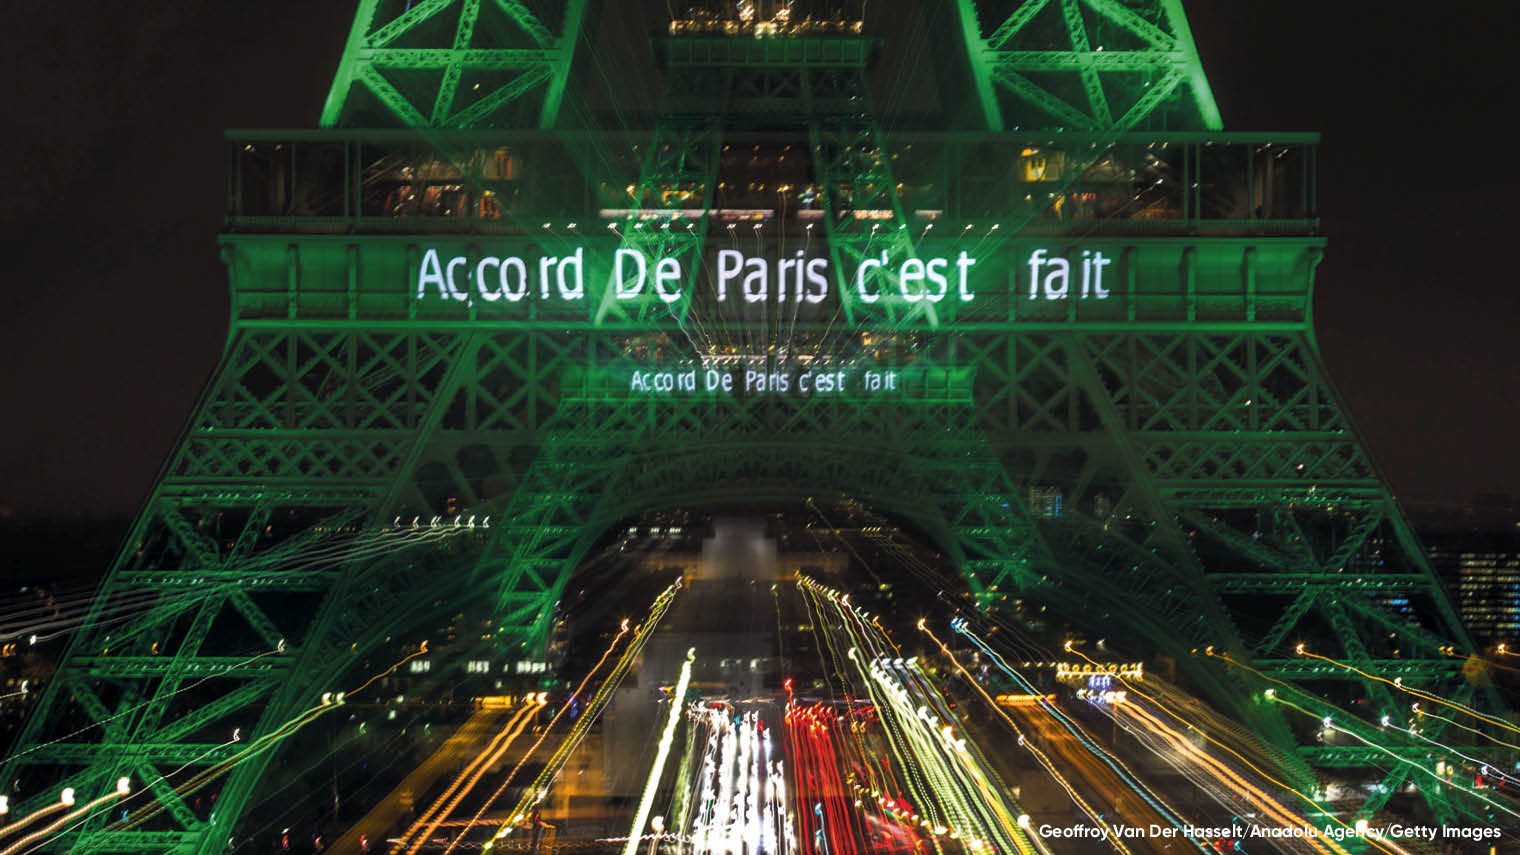 The Eiffel Tower lite up after Paris Agreement 2015